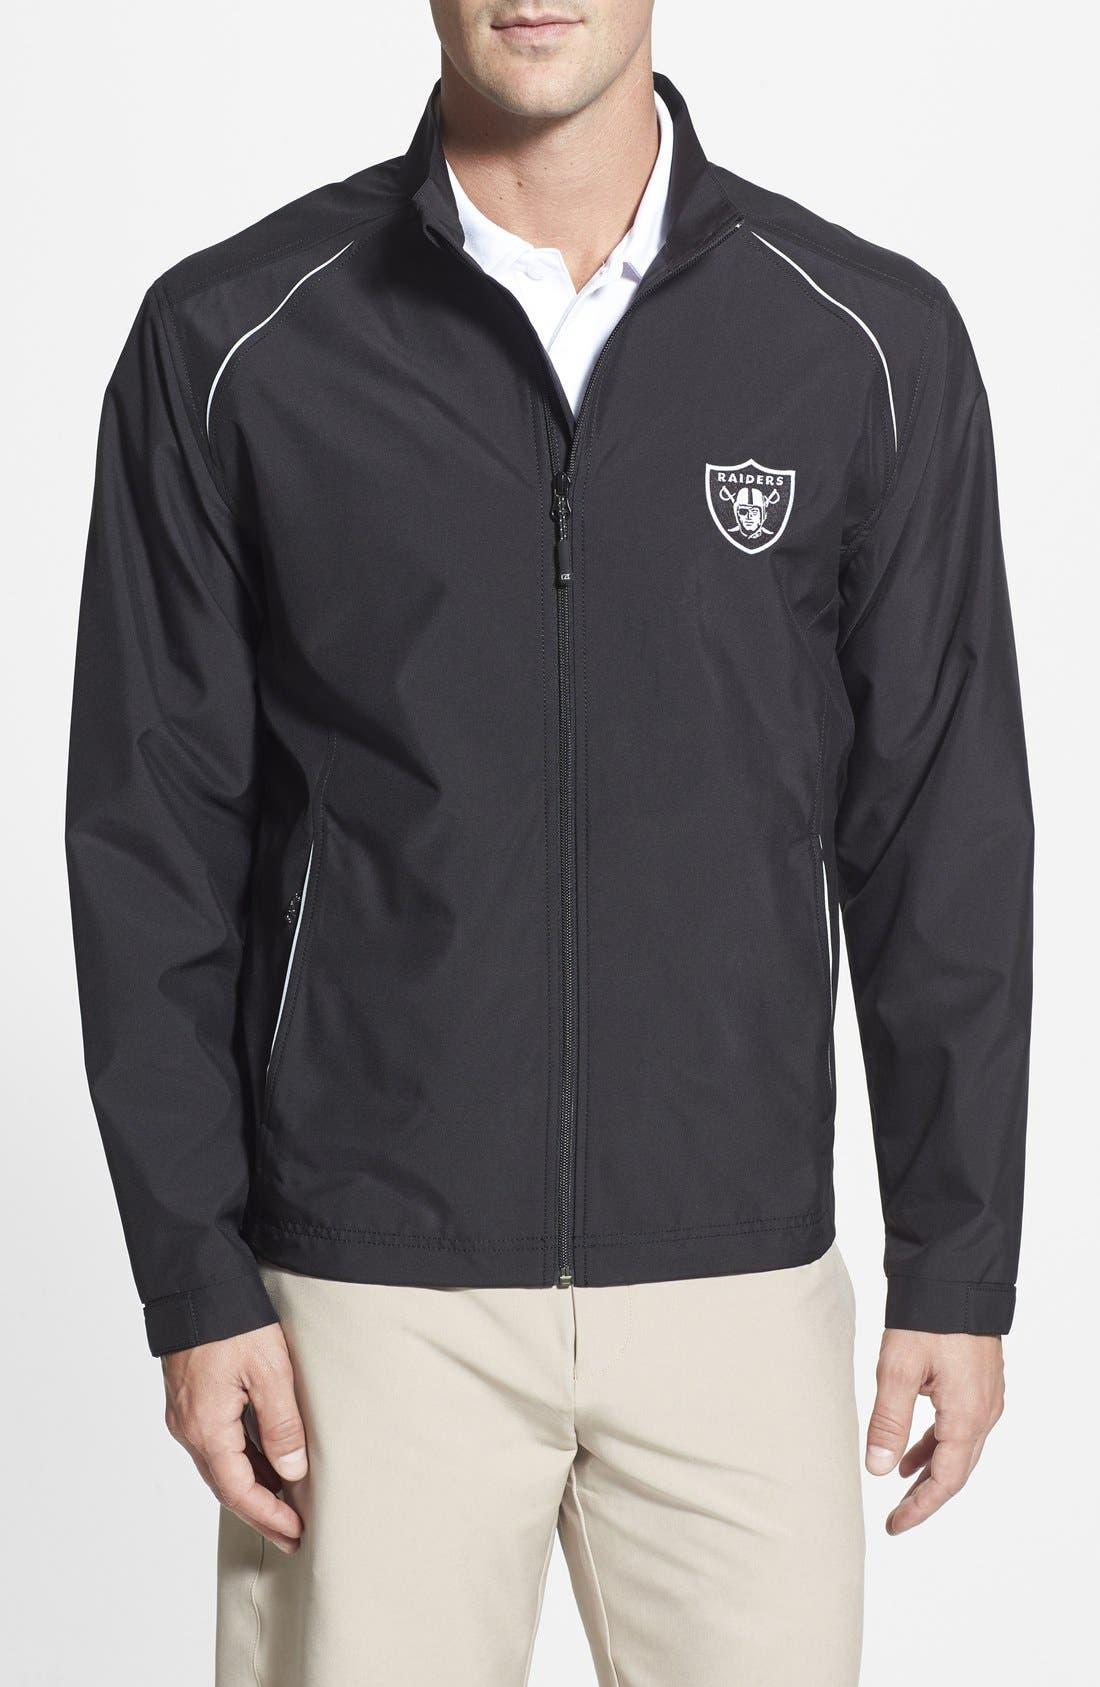 Oakland Raiders - Beacon WeatherTec Wind & Water Resistant Jacket,                         Main,                         color, Black